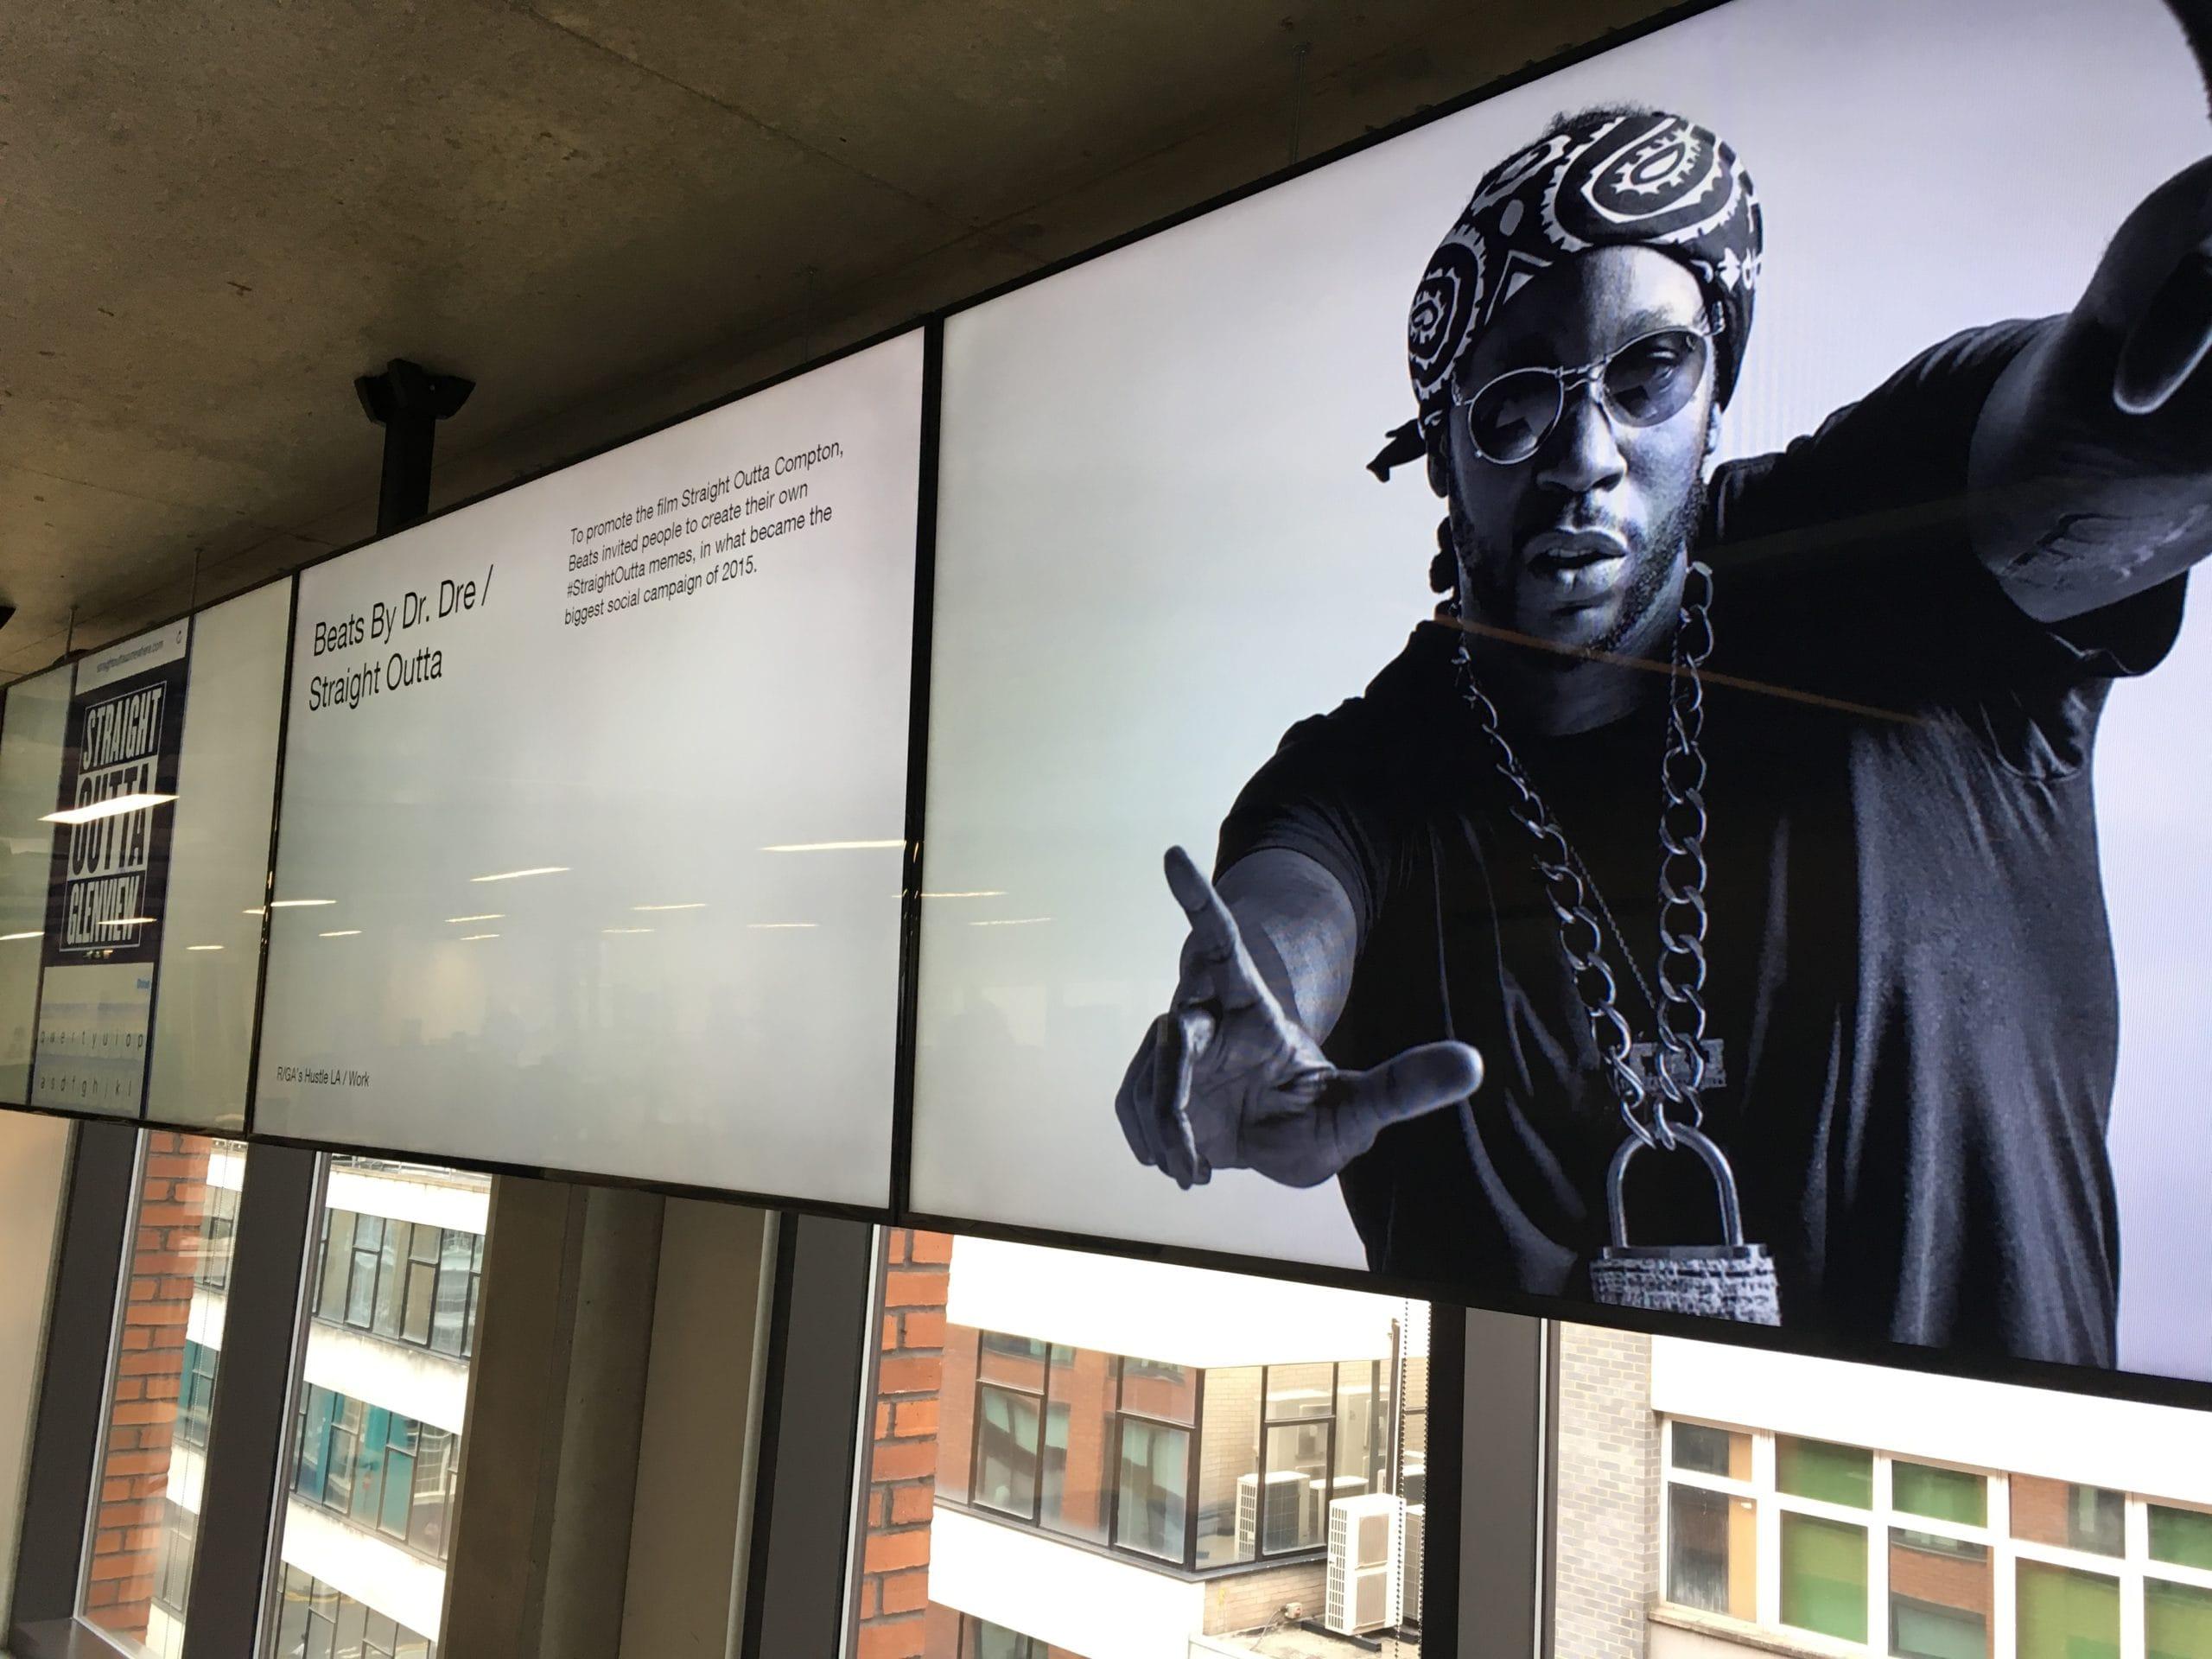 67 Digital Signage Displays